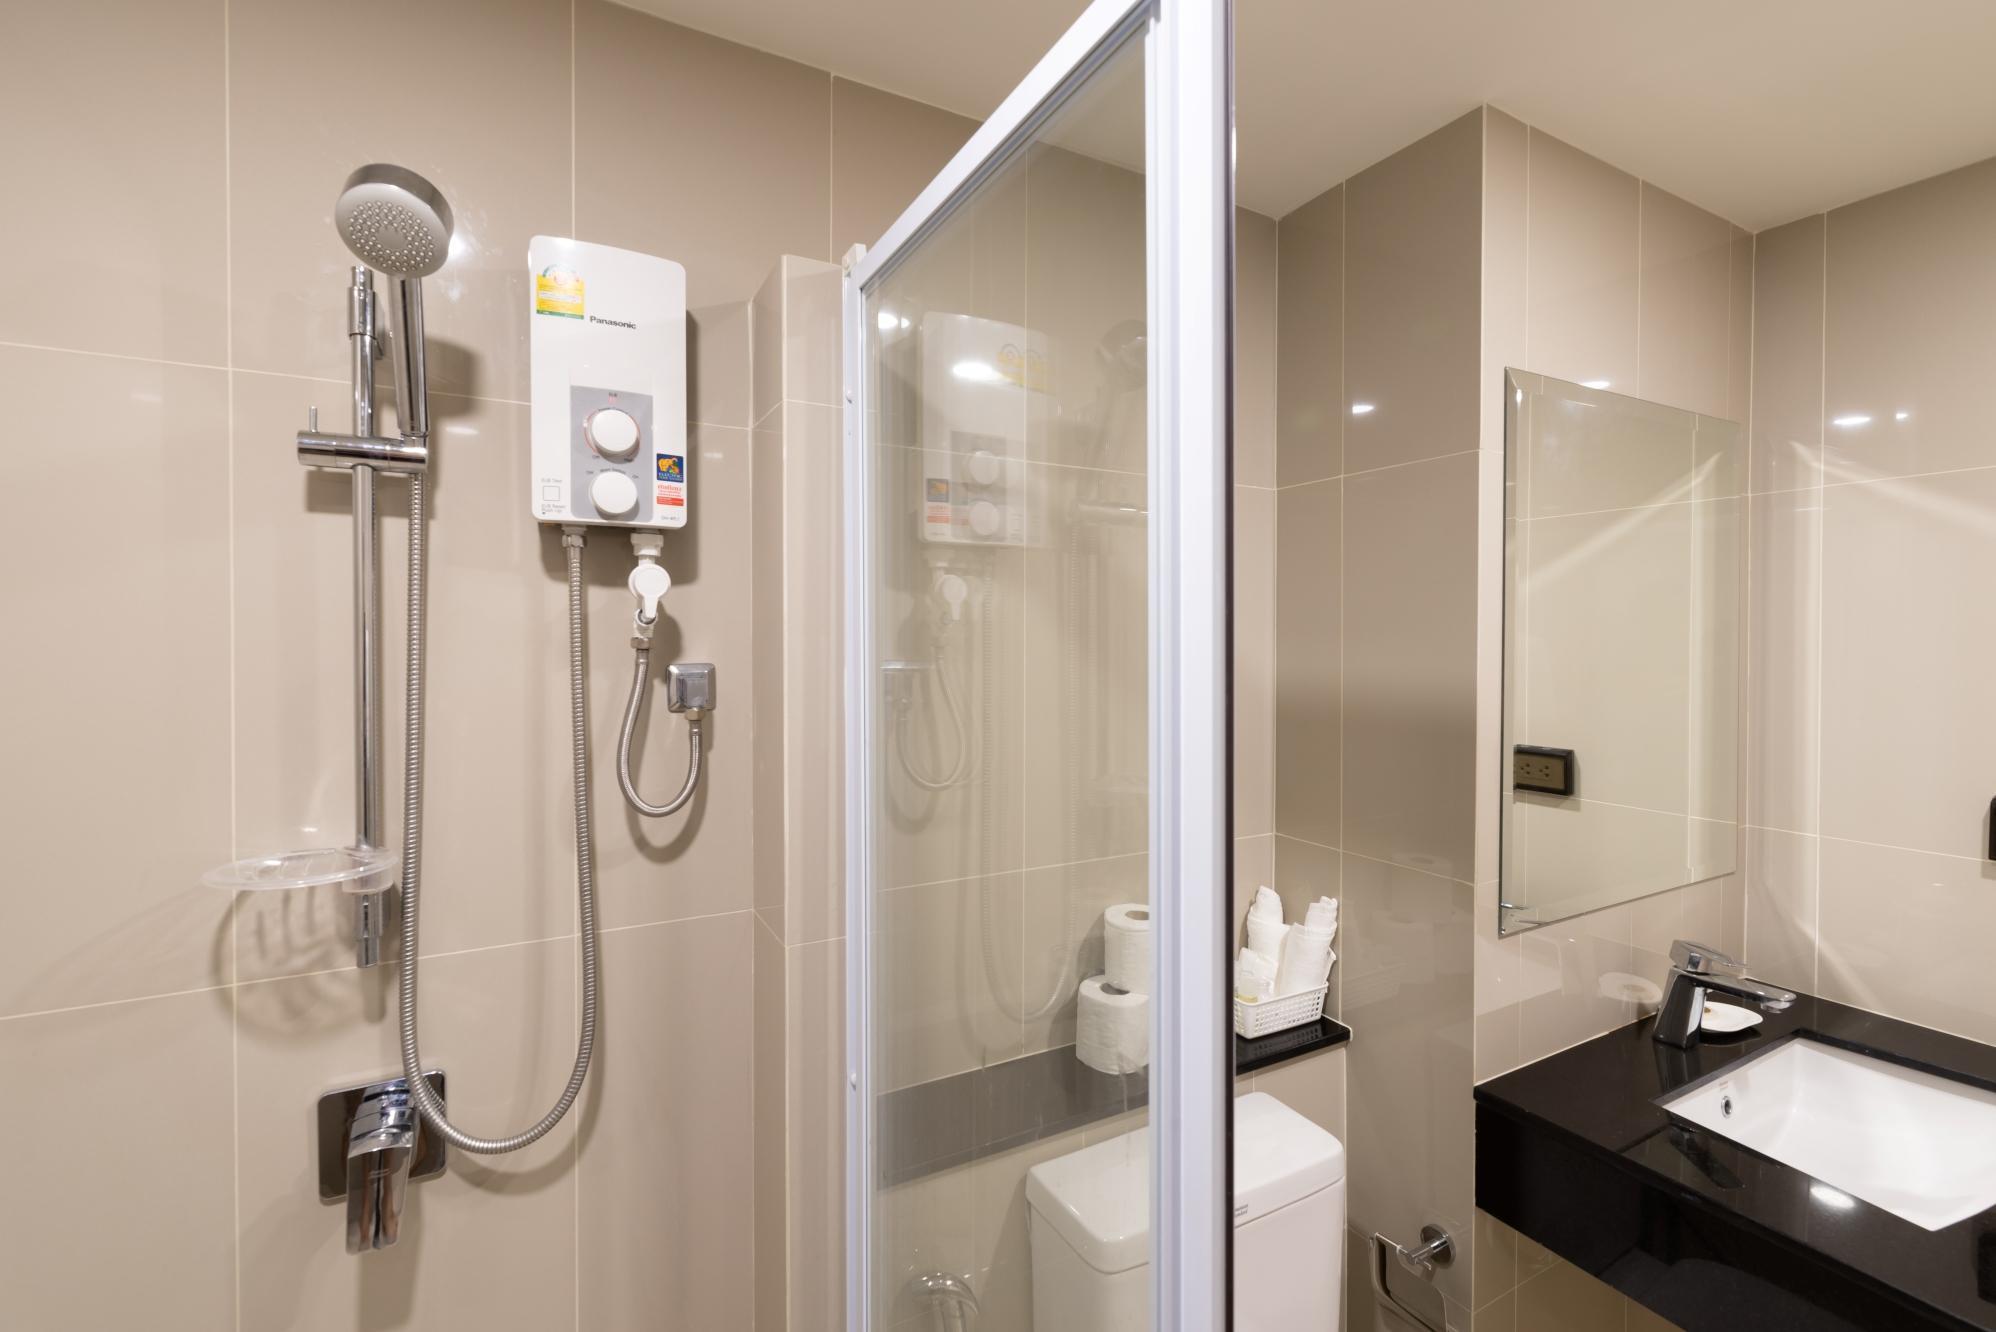 One Bedroom Suite in Nimman by Belcarra Spaces P62 สตูดิโอ อพาร์ตเมนต์ 1 ห้องน้ำส่วนตัว ขนาด 45 ตร.ม. – นิมมานเหมินทร์